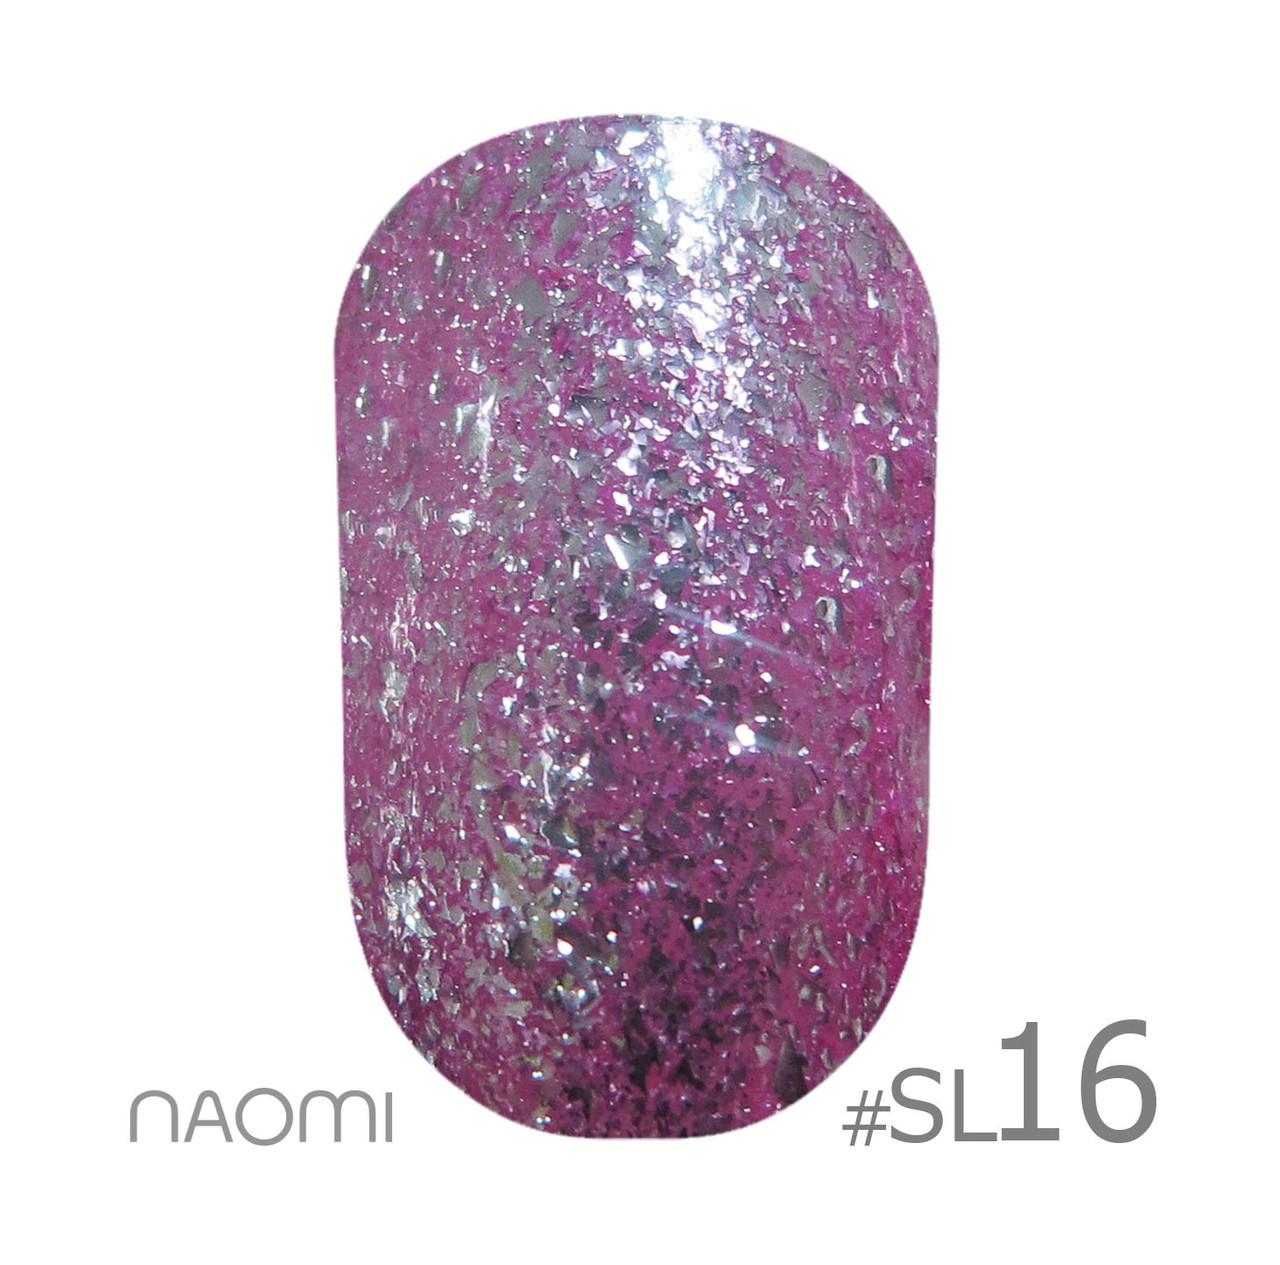 Гель-лак для нігтів 6 мл Naomi Self Illuminated Collection SI 16